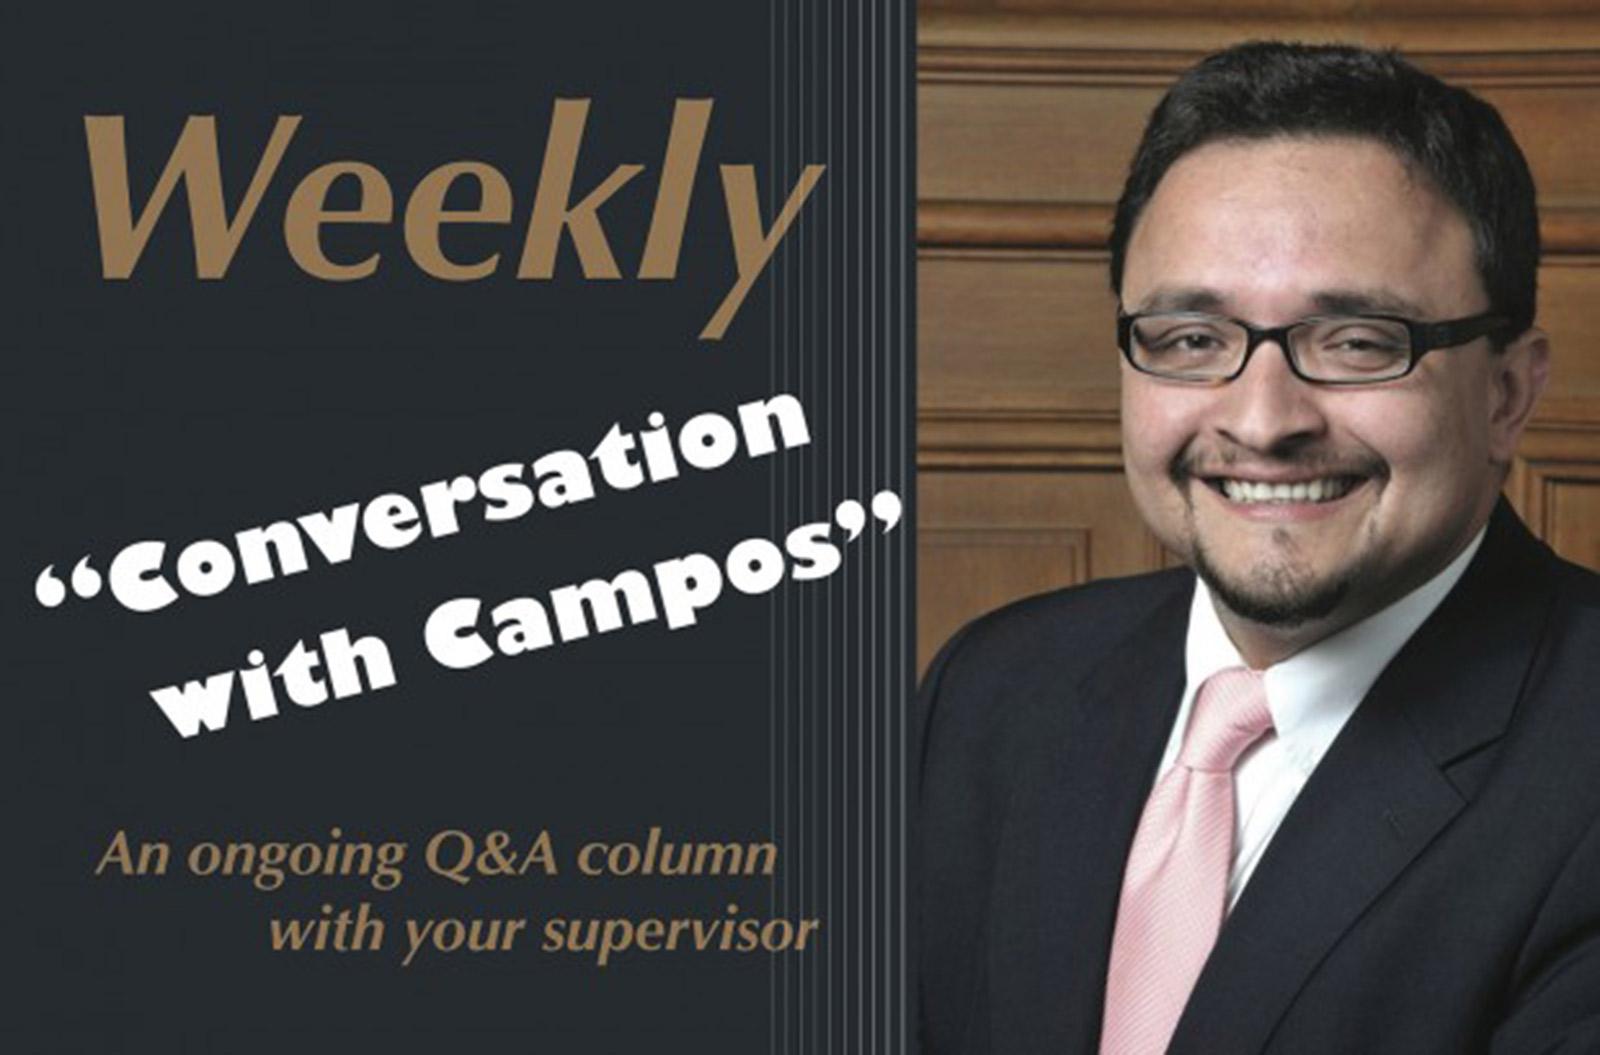 Conversation With Campos